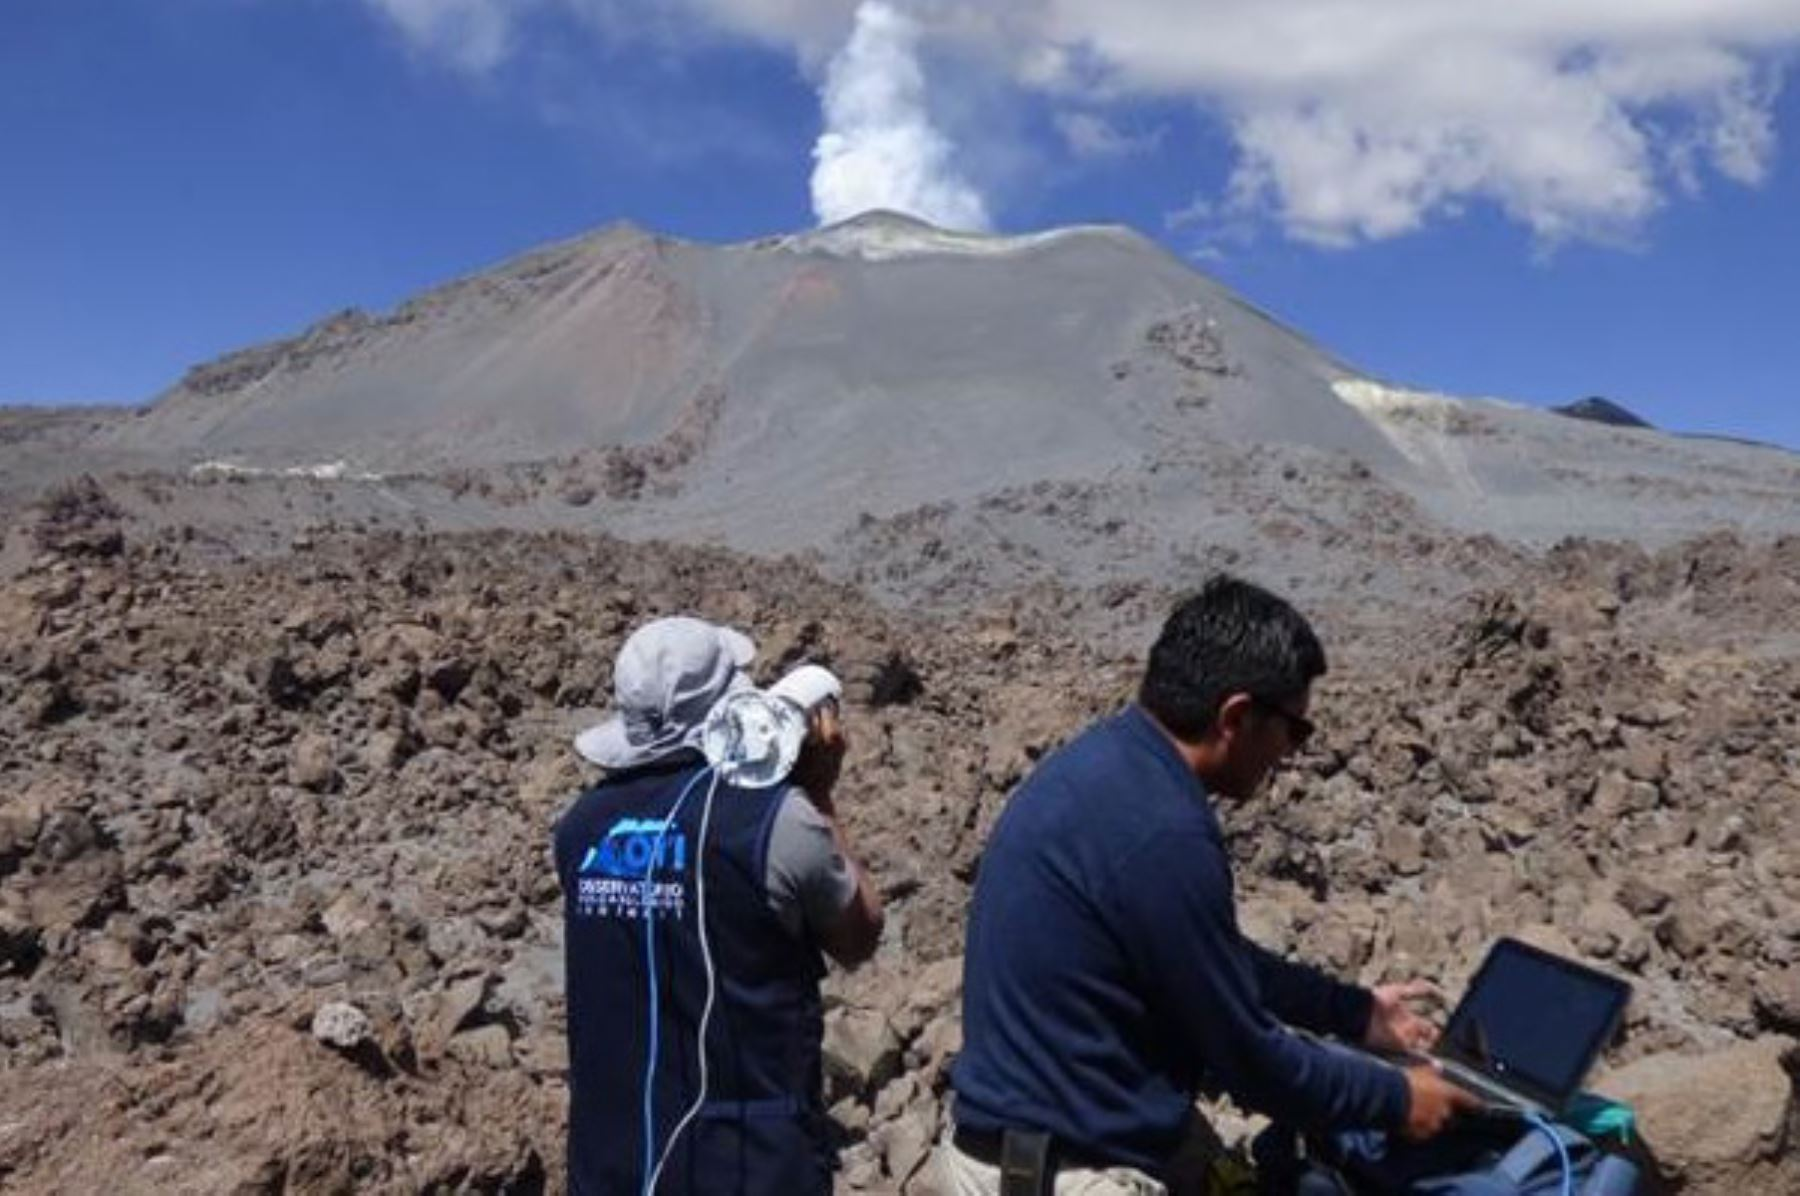 Ingemmet elaborará mapa de peligro del volcán Chachani. ANDINA/Difusión